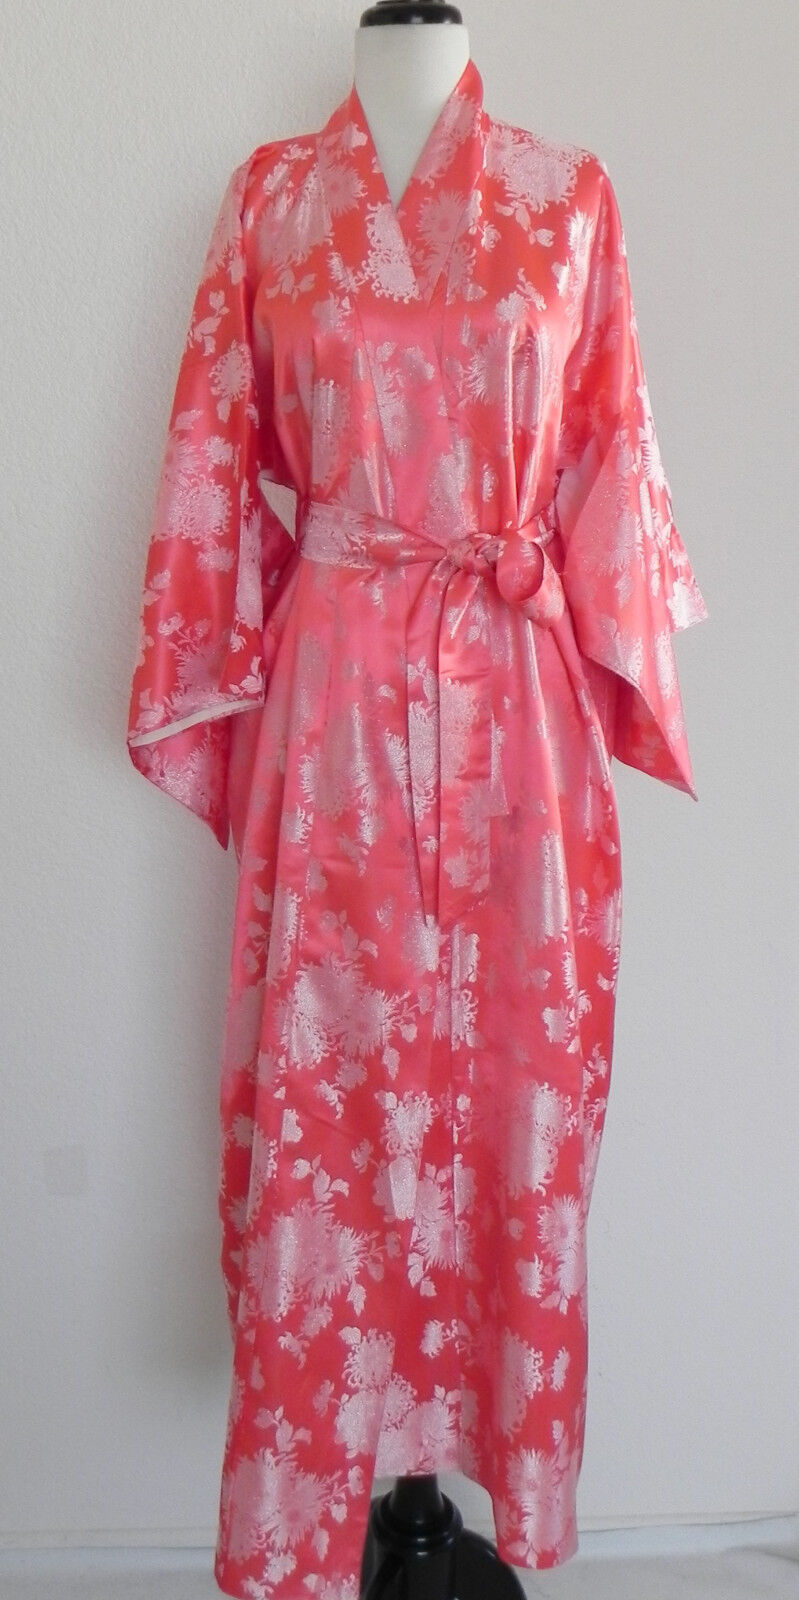 Joli Made in Japan Silk Robe Full Length Peach Tone Belted One Size